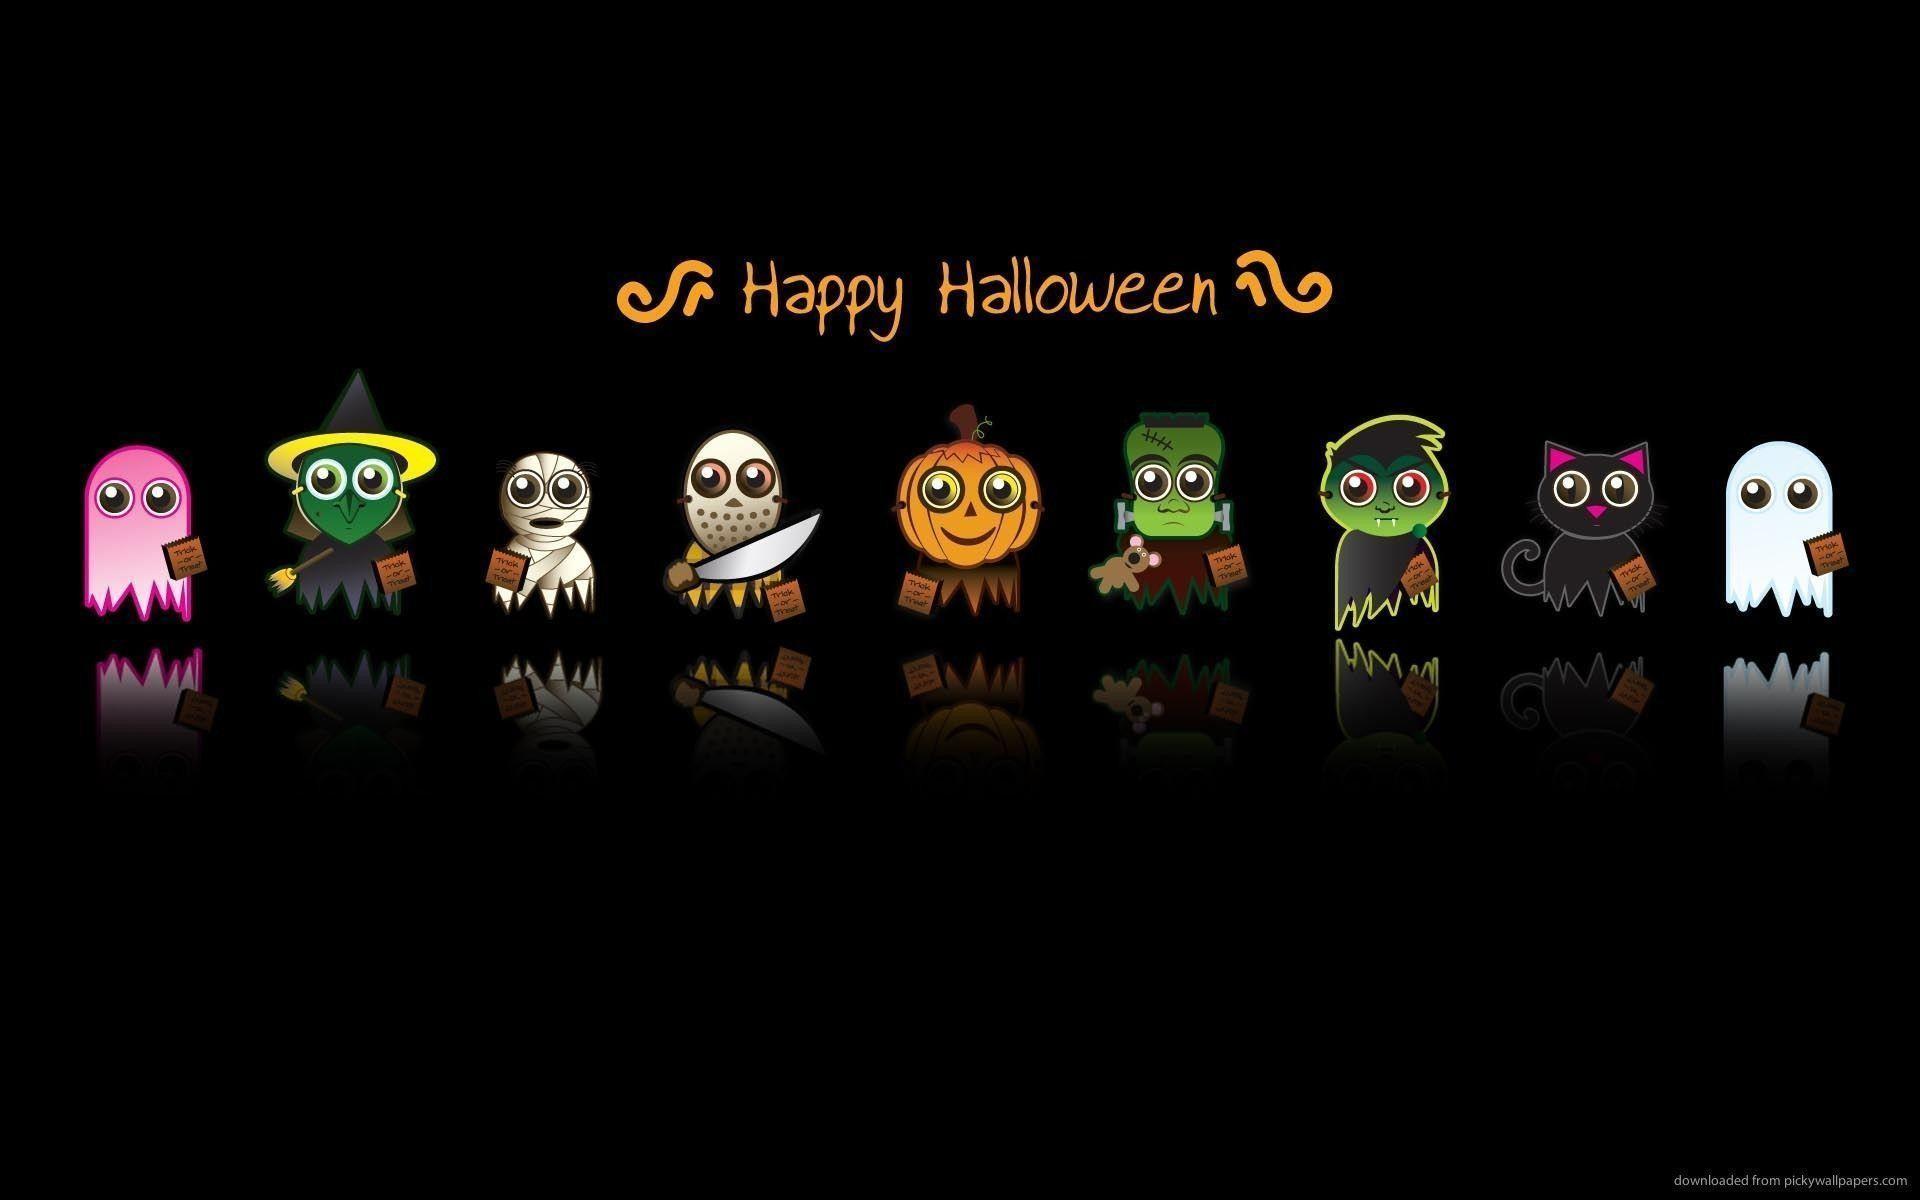 Cool Wallpaper Halloween Girly - 544301  Photograph_469628.jpg